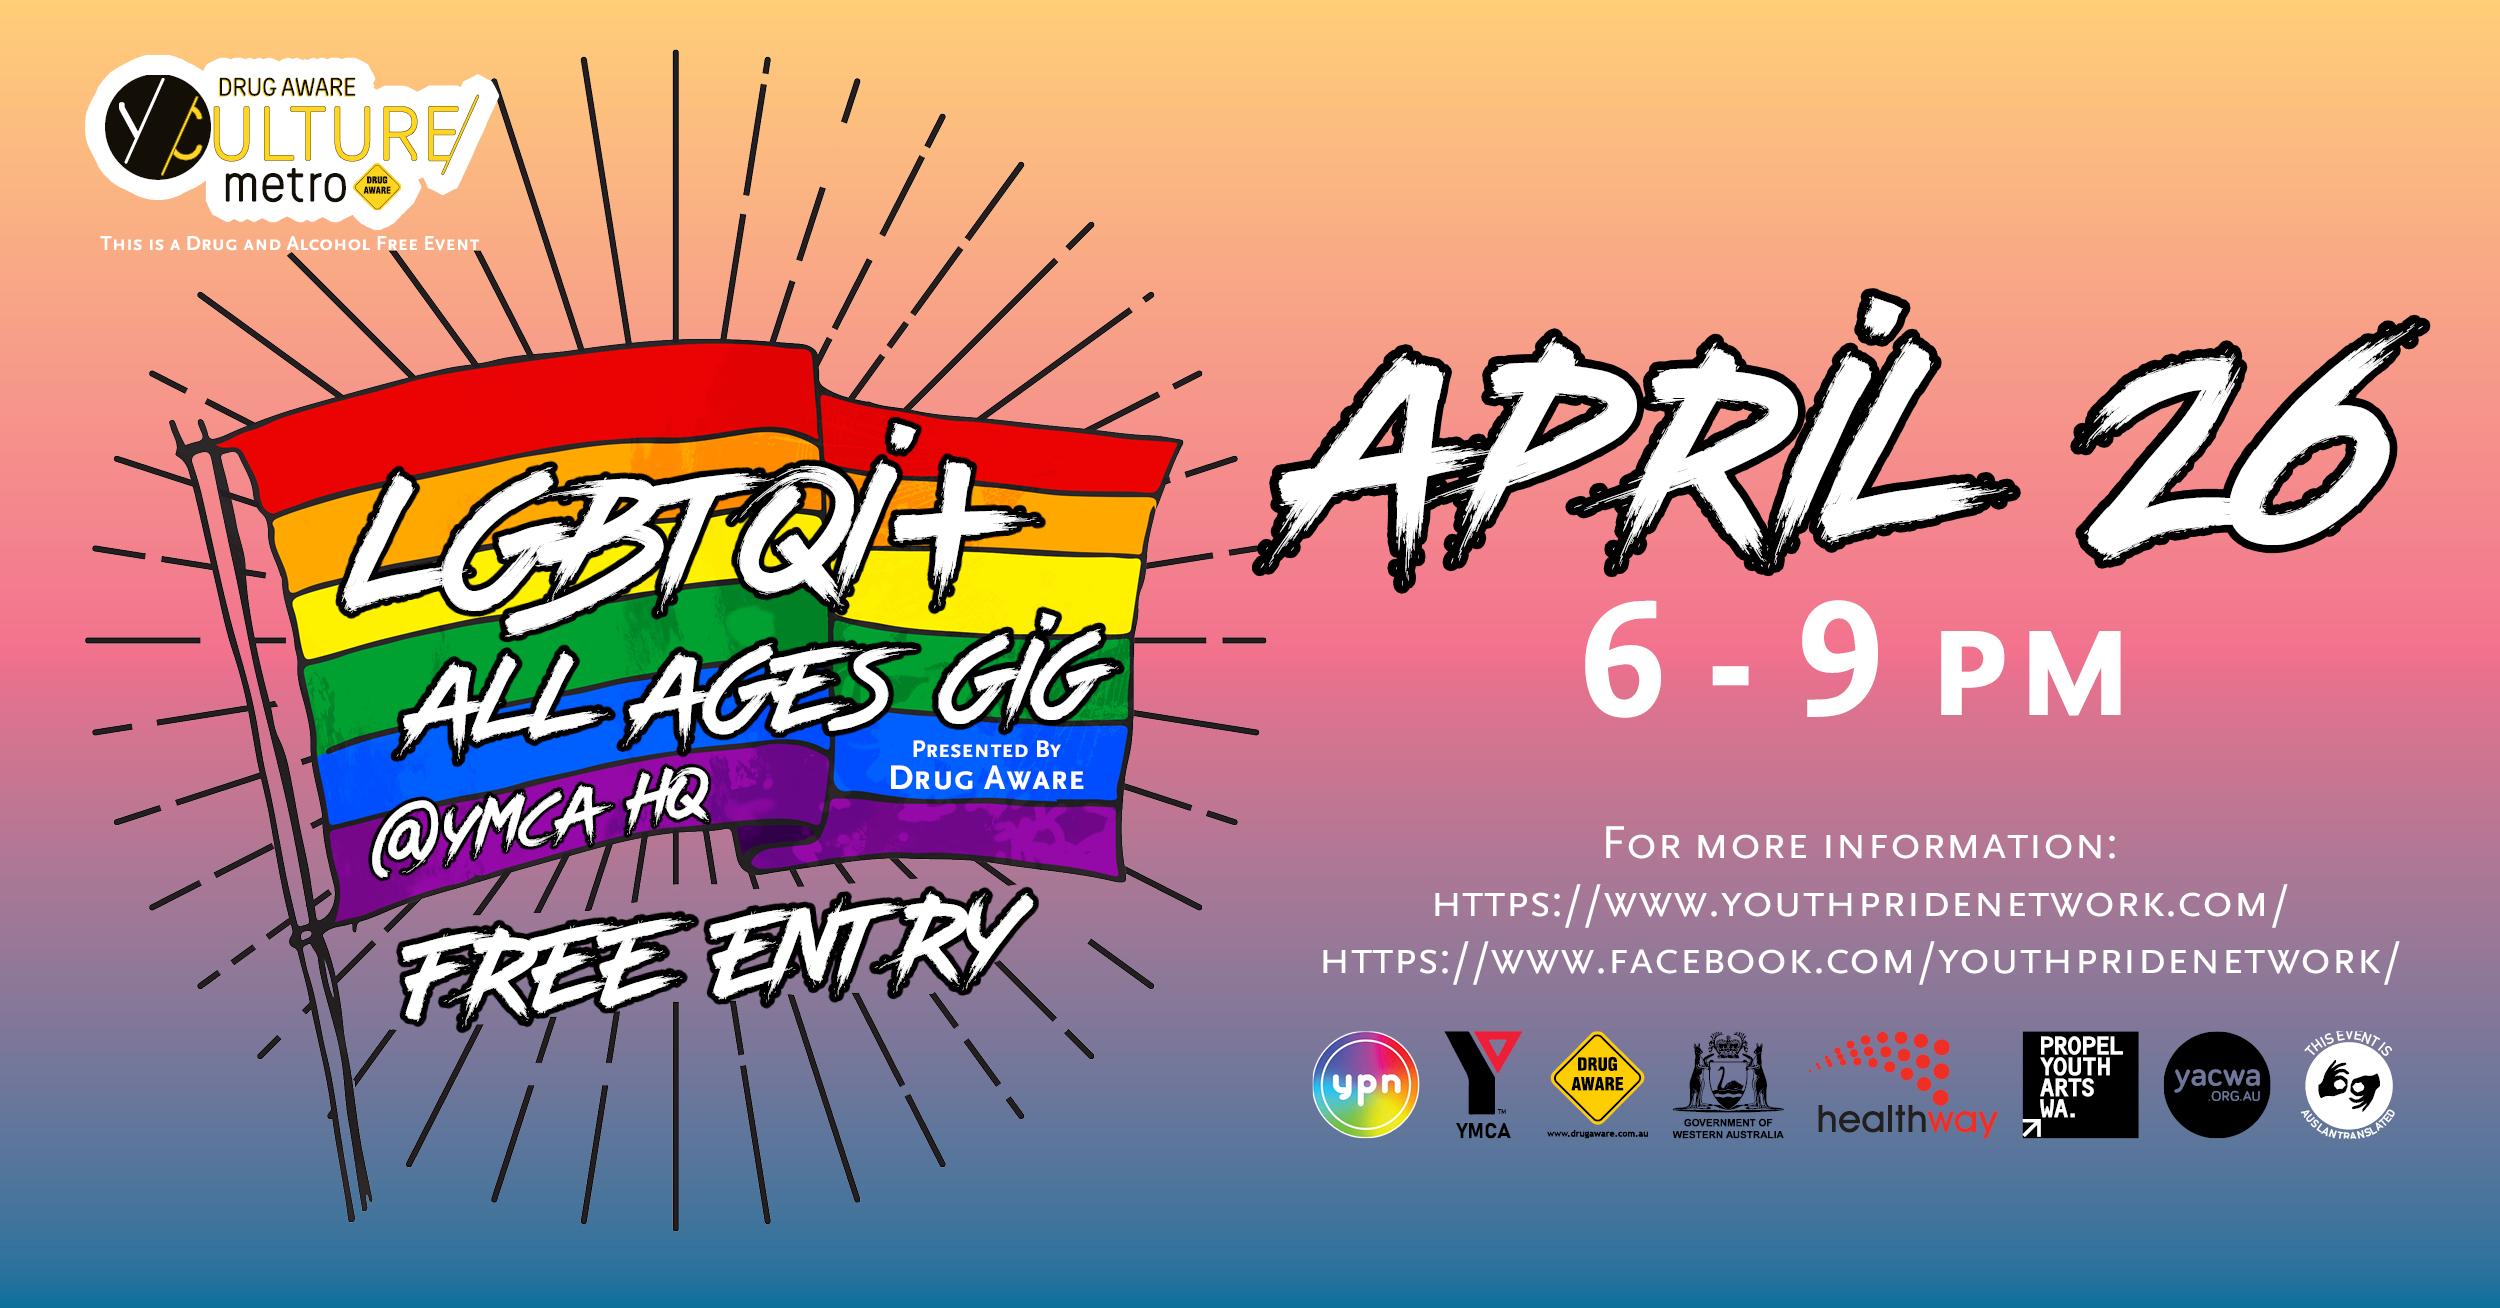 Youth Pride Network [Leederville, WA]